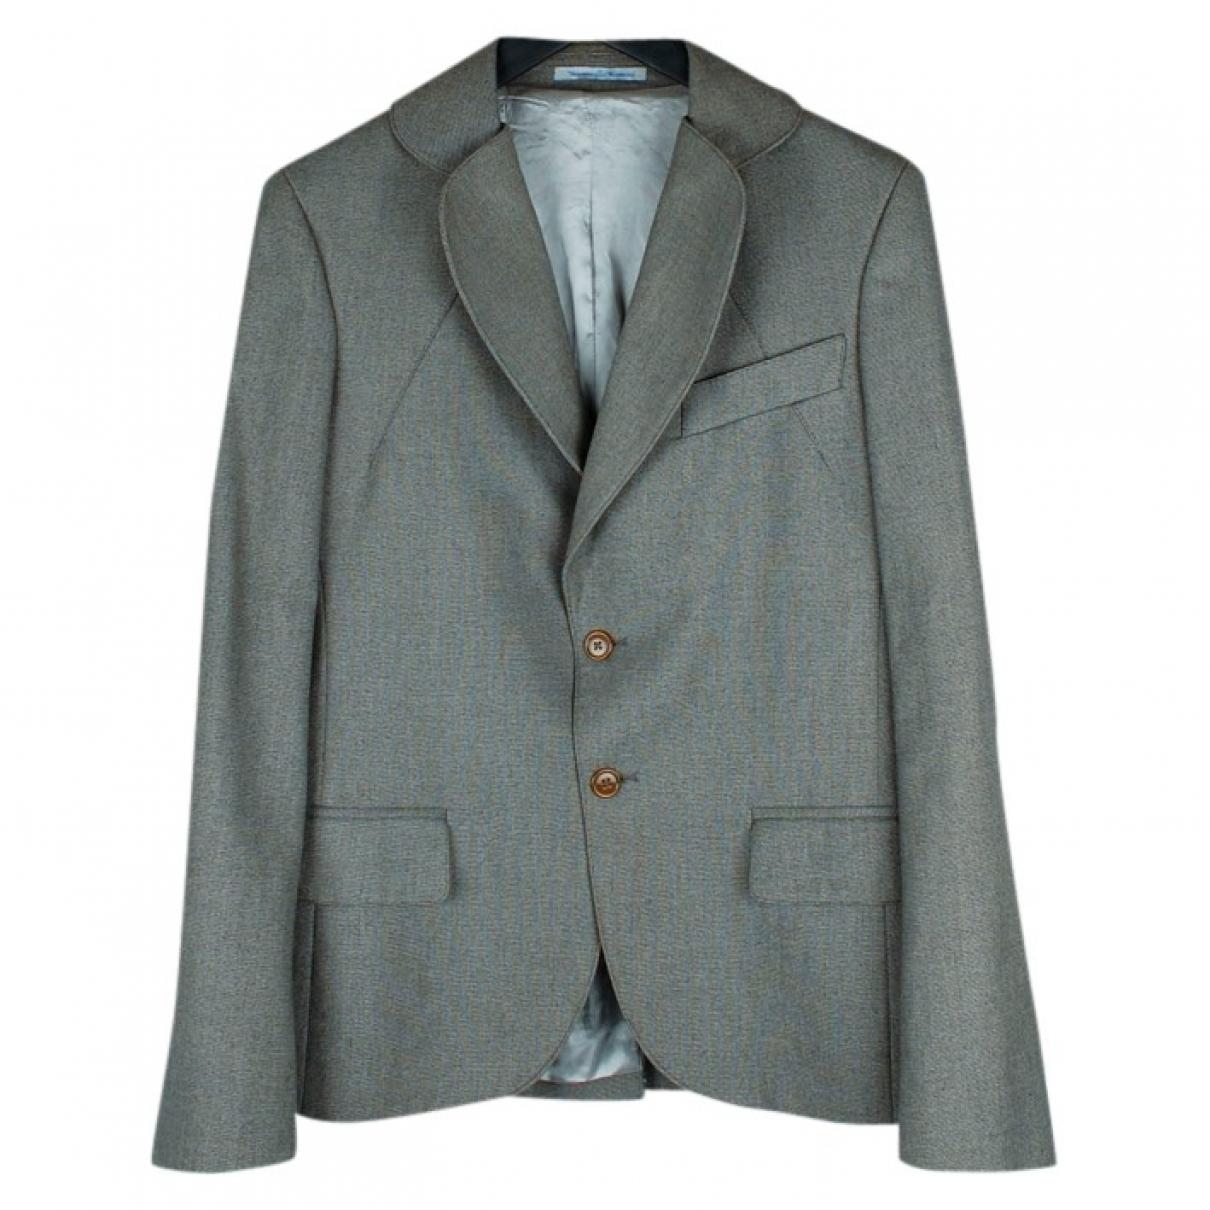 Vivienne Westwood \N Grey Cotton jacket  for Men M International